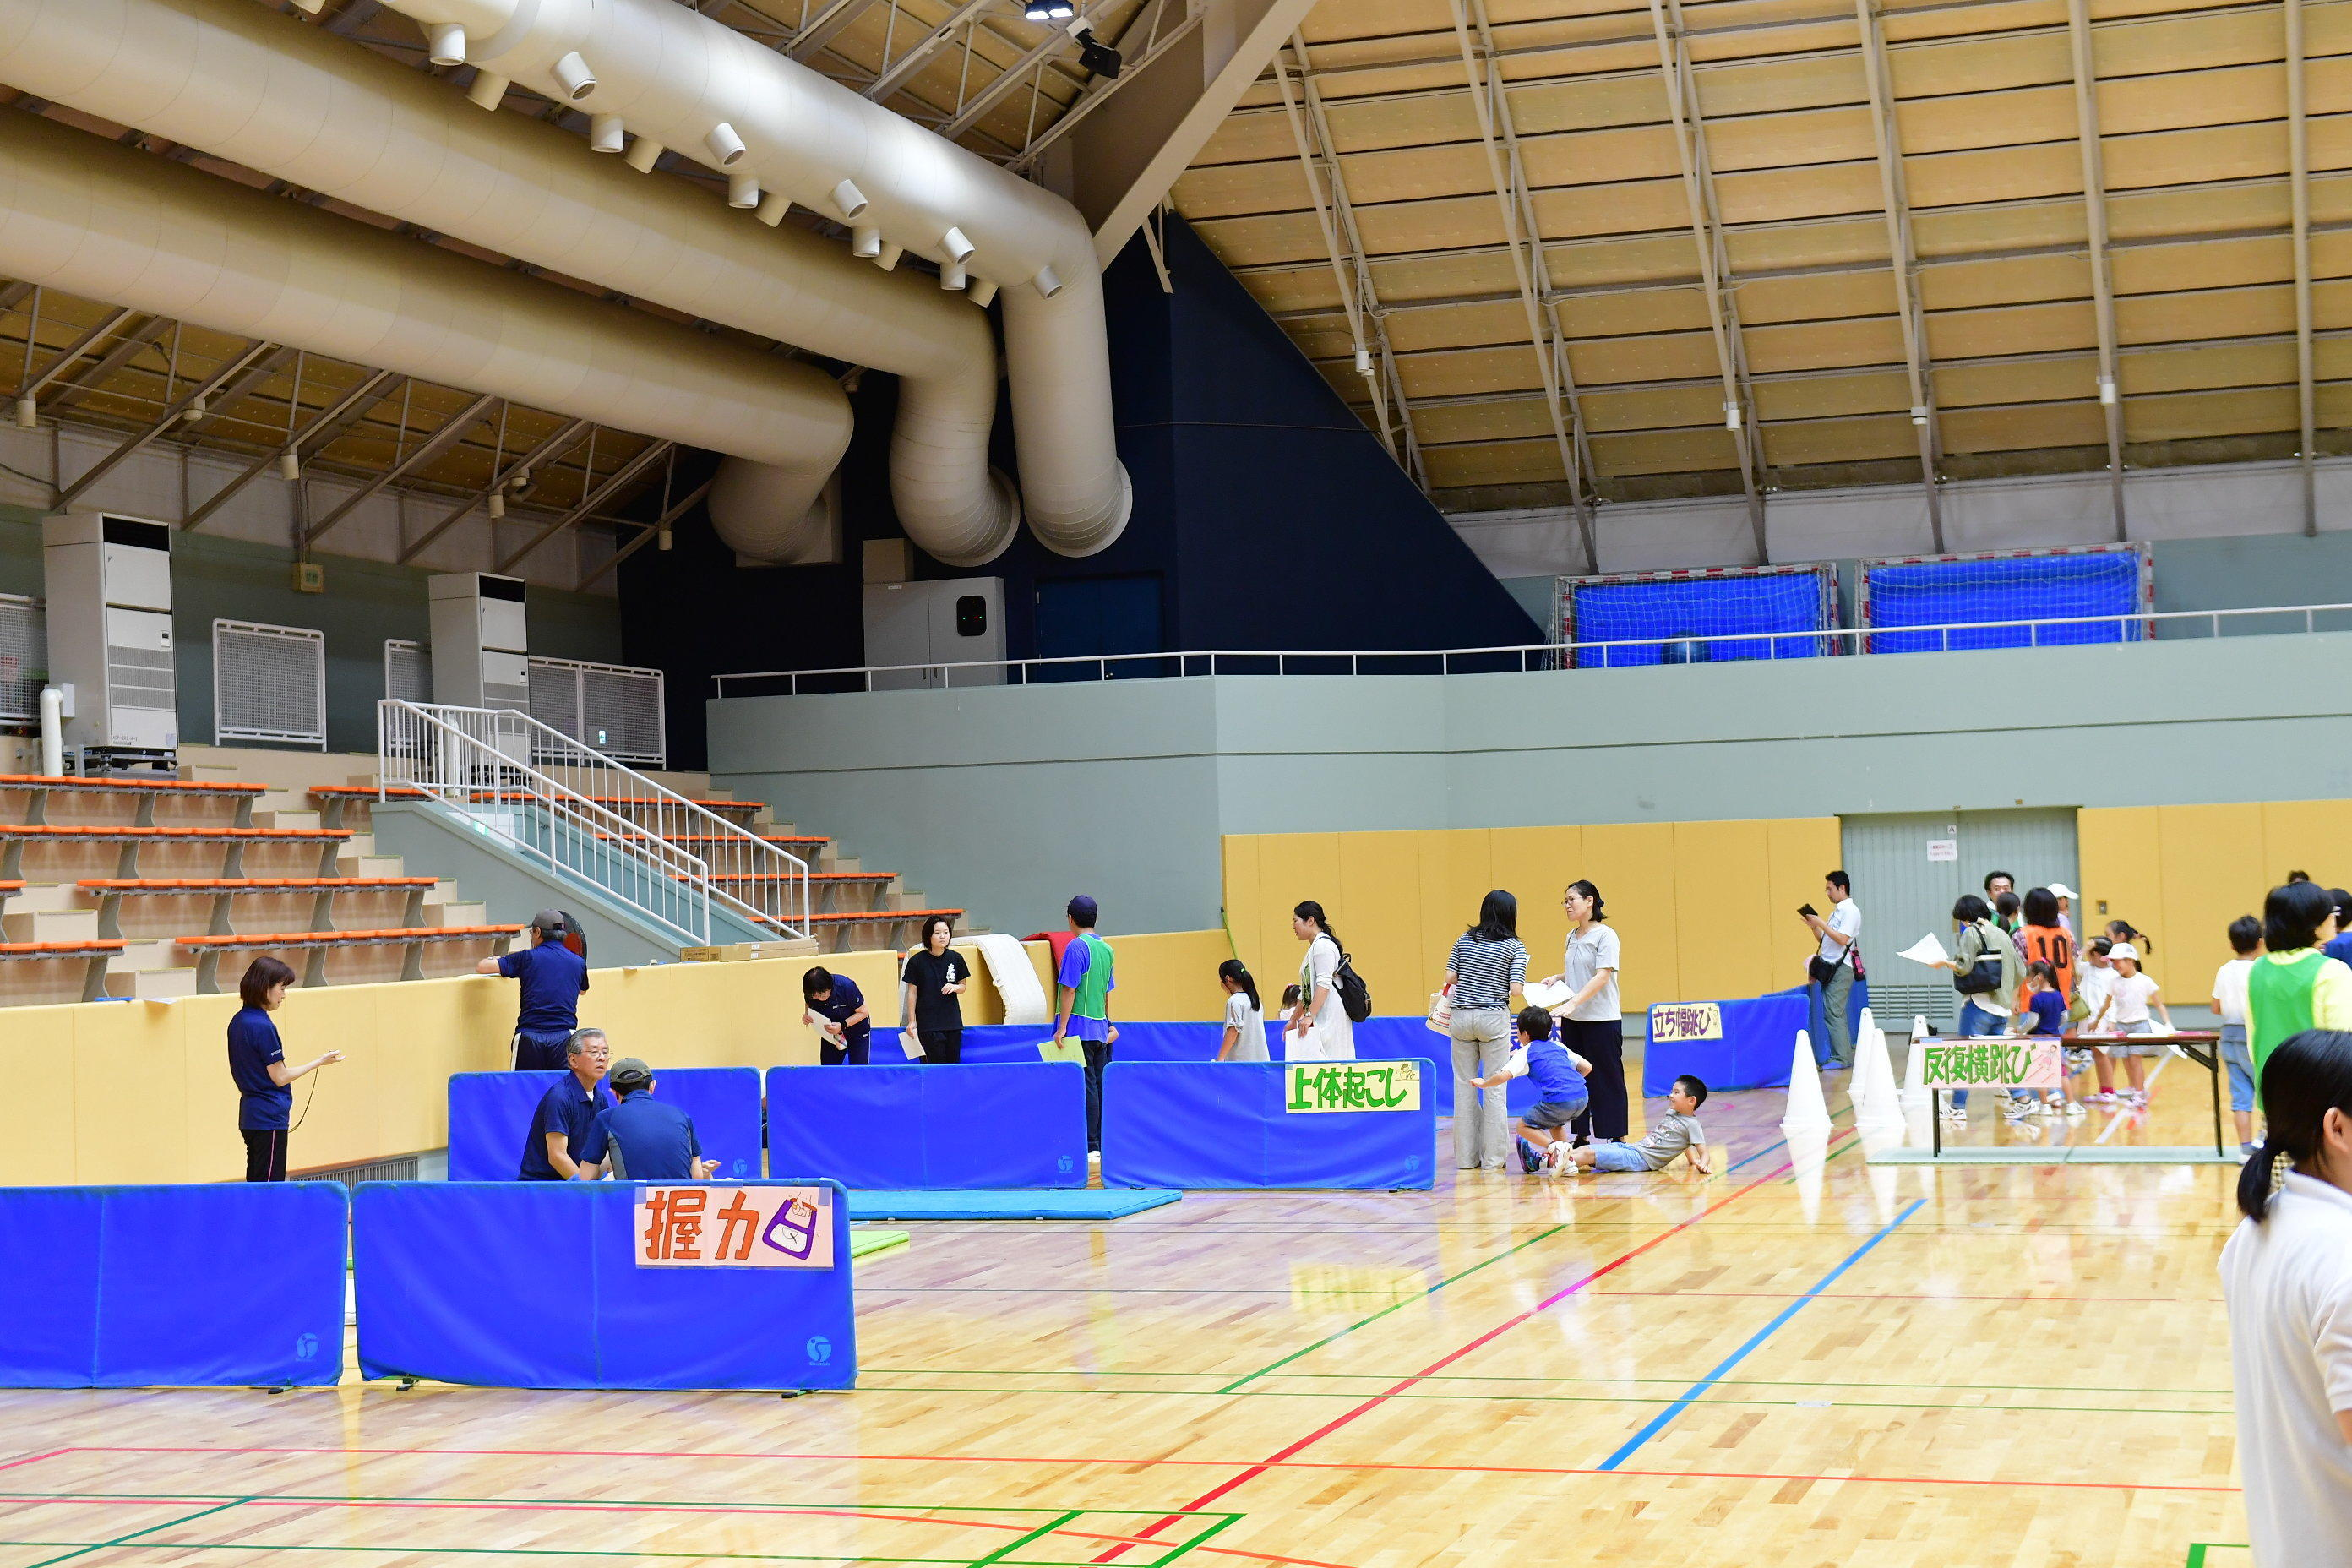 http://news.yoshimoto.co.jp/20181008191334-f1e03e1fcc91b2cc78327bf80a9e338aca23b97a.jpg